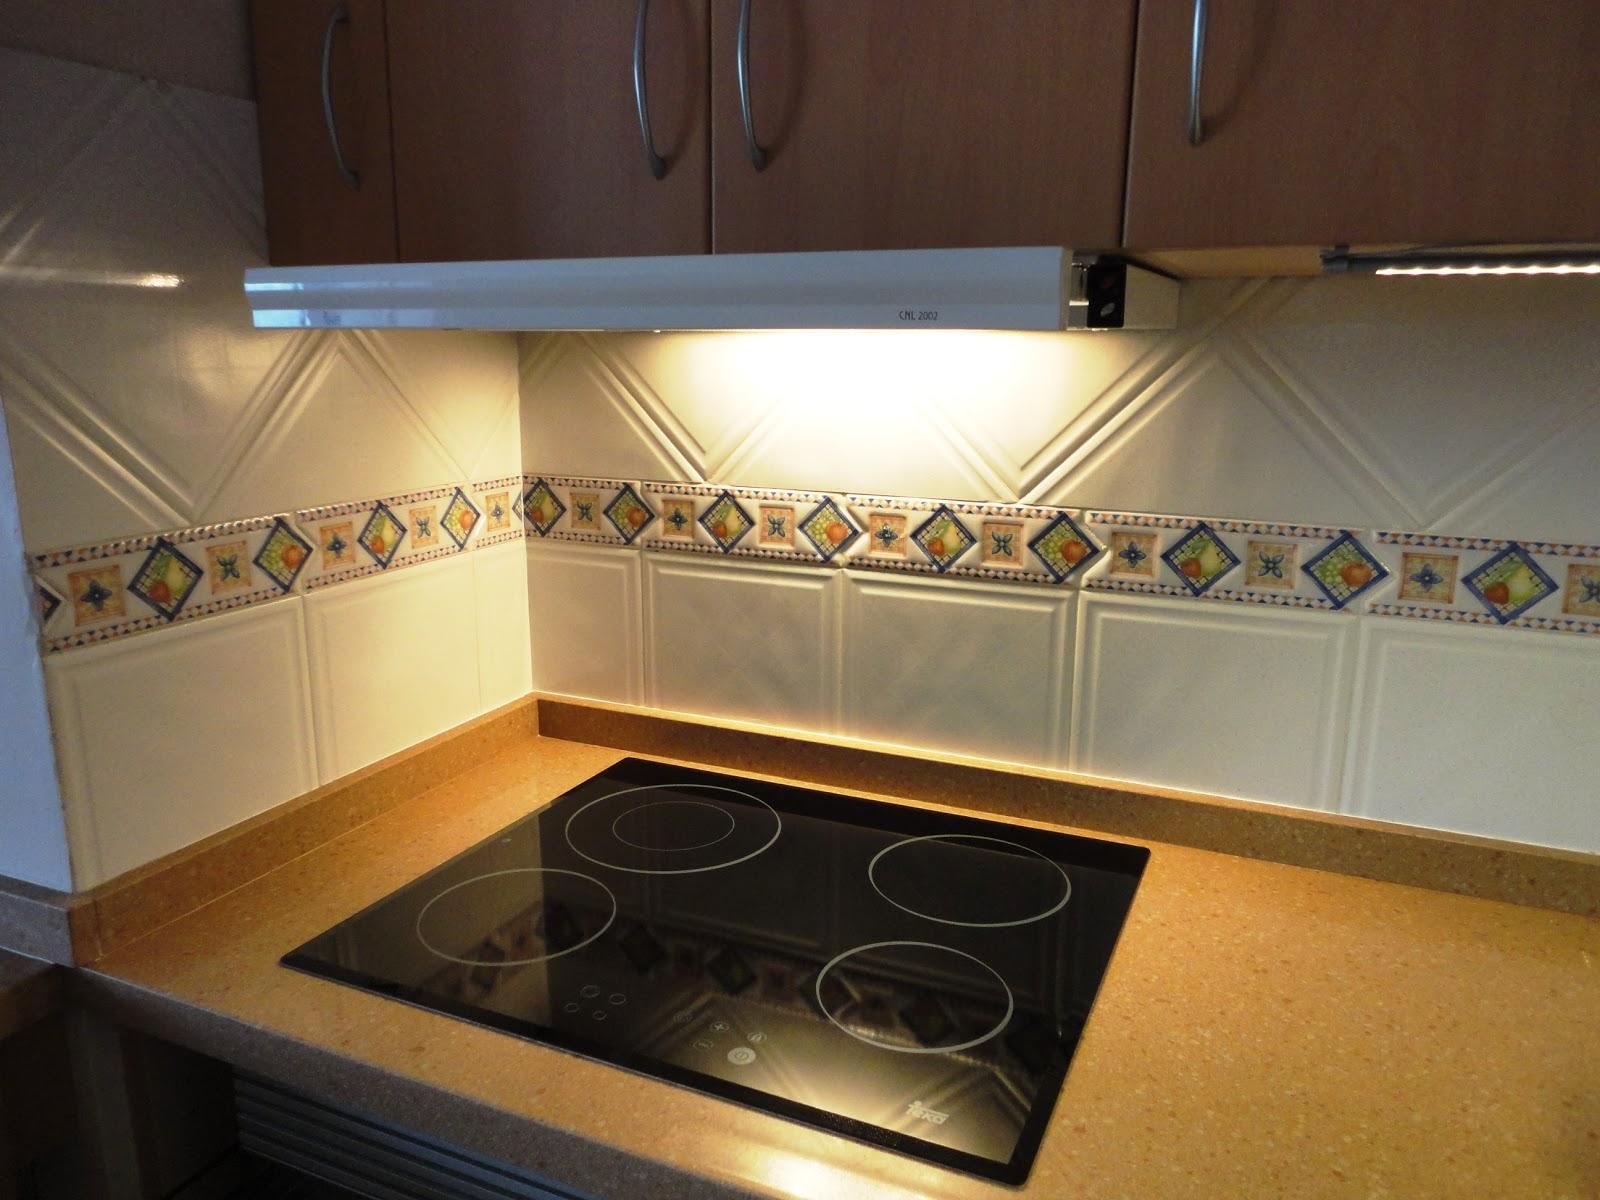 Vendo piso en ingenio cocina - Cocina vitroceramica teka ...